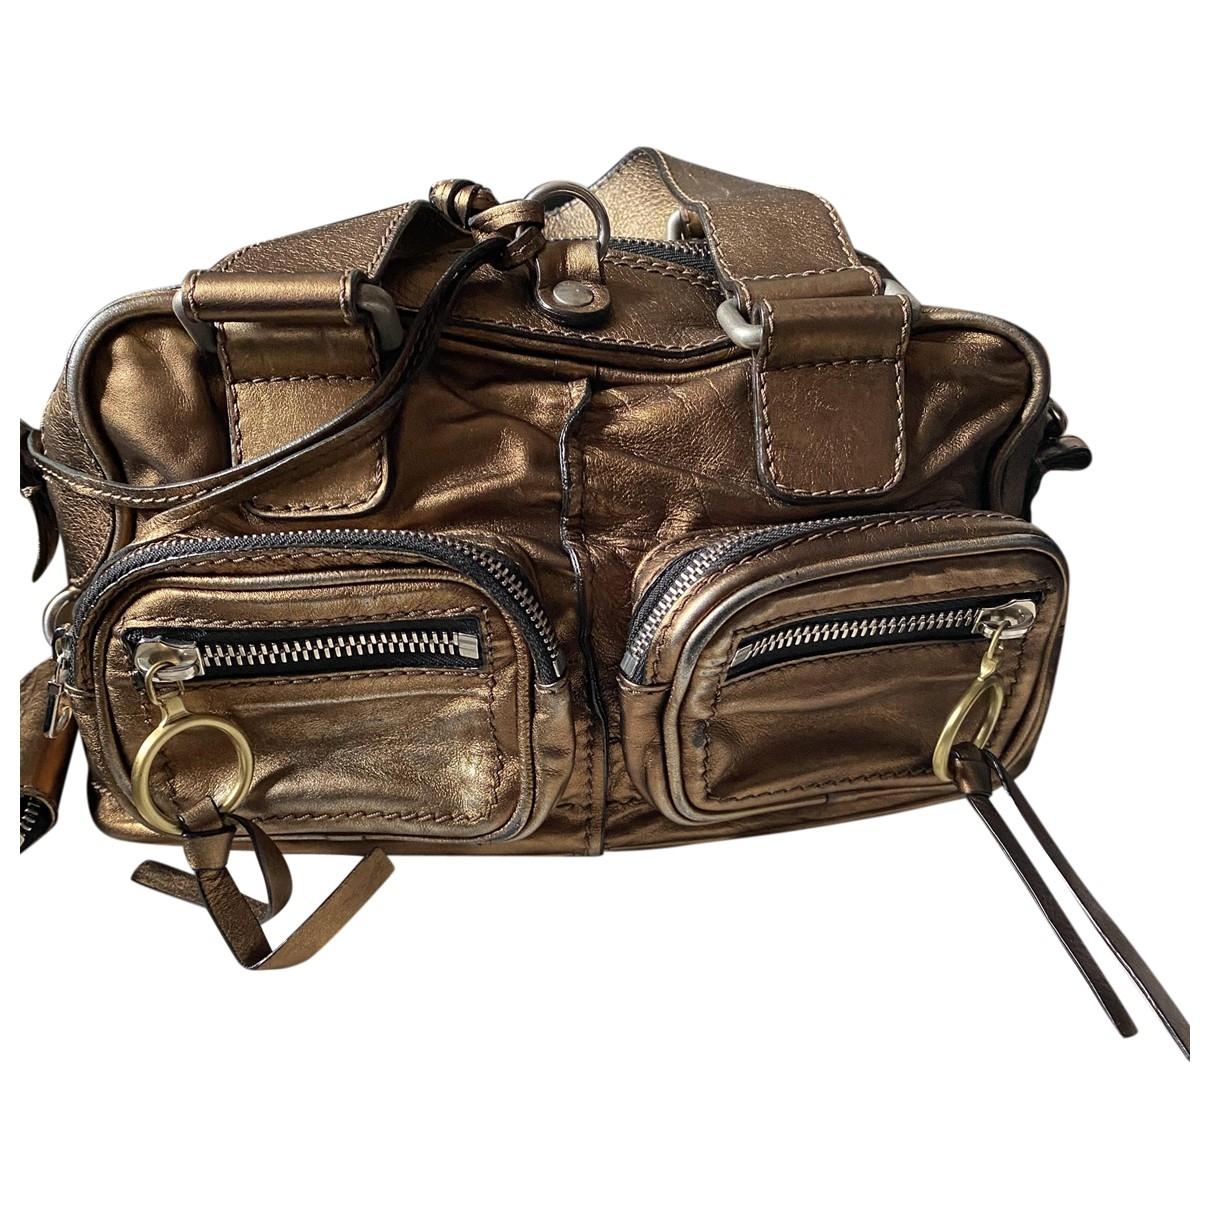 Chloé \N Gold Leather handbag for Women \N